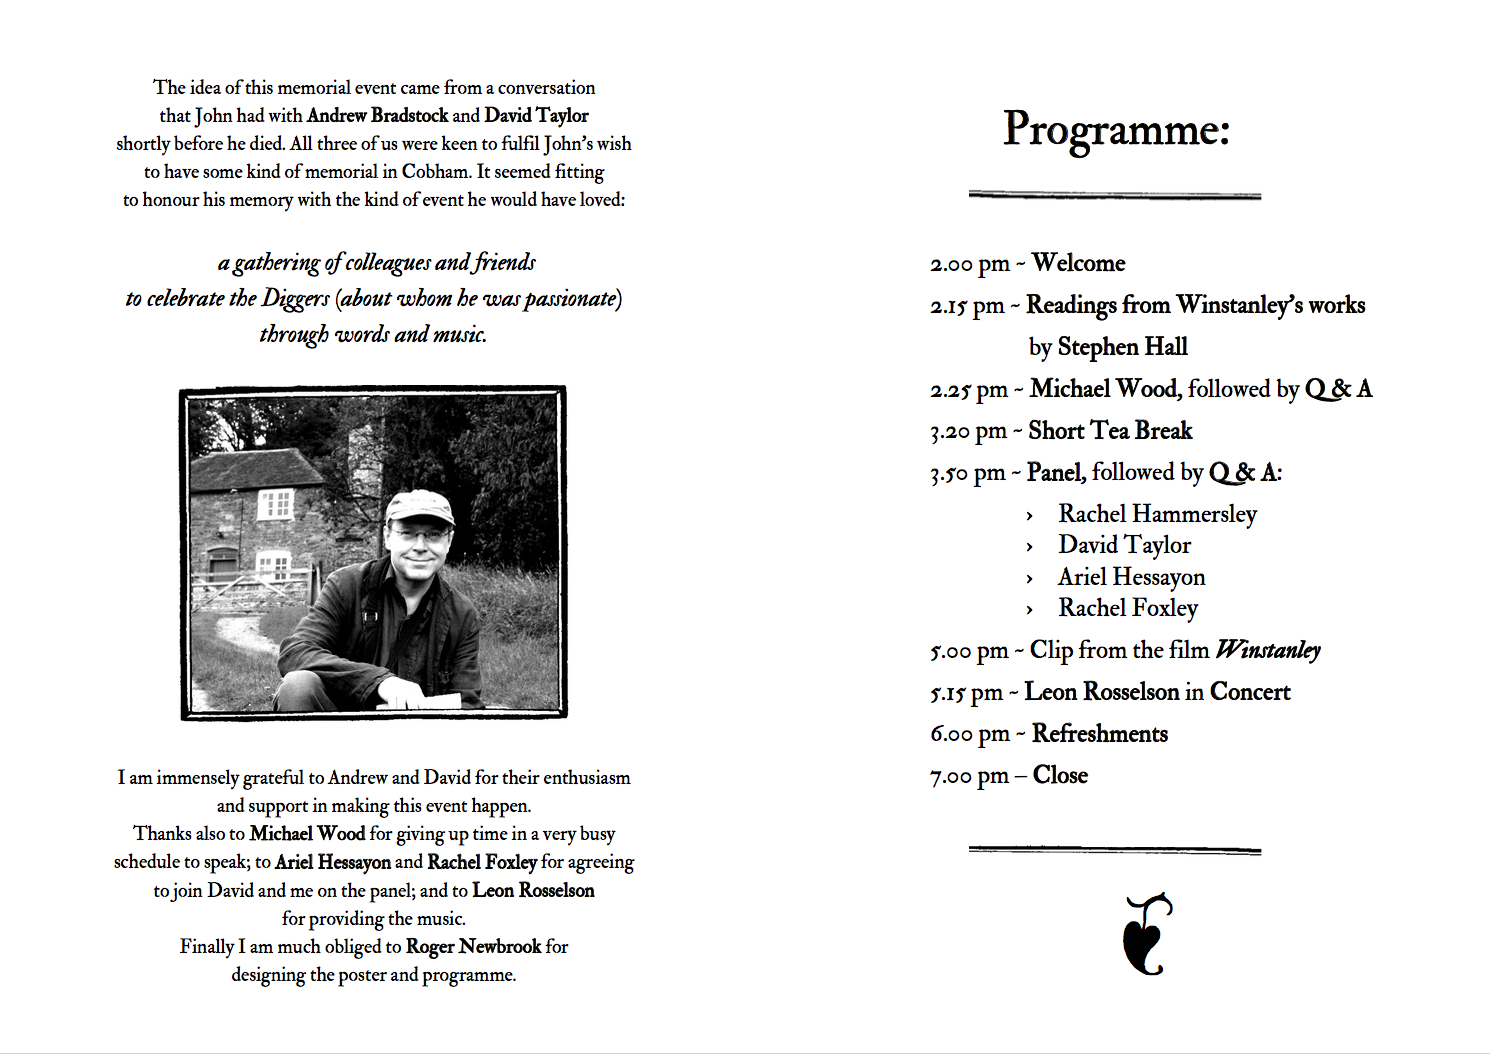 Brave Community programme, designed by Roger Newbrook.